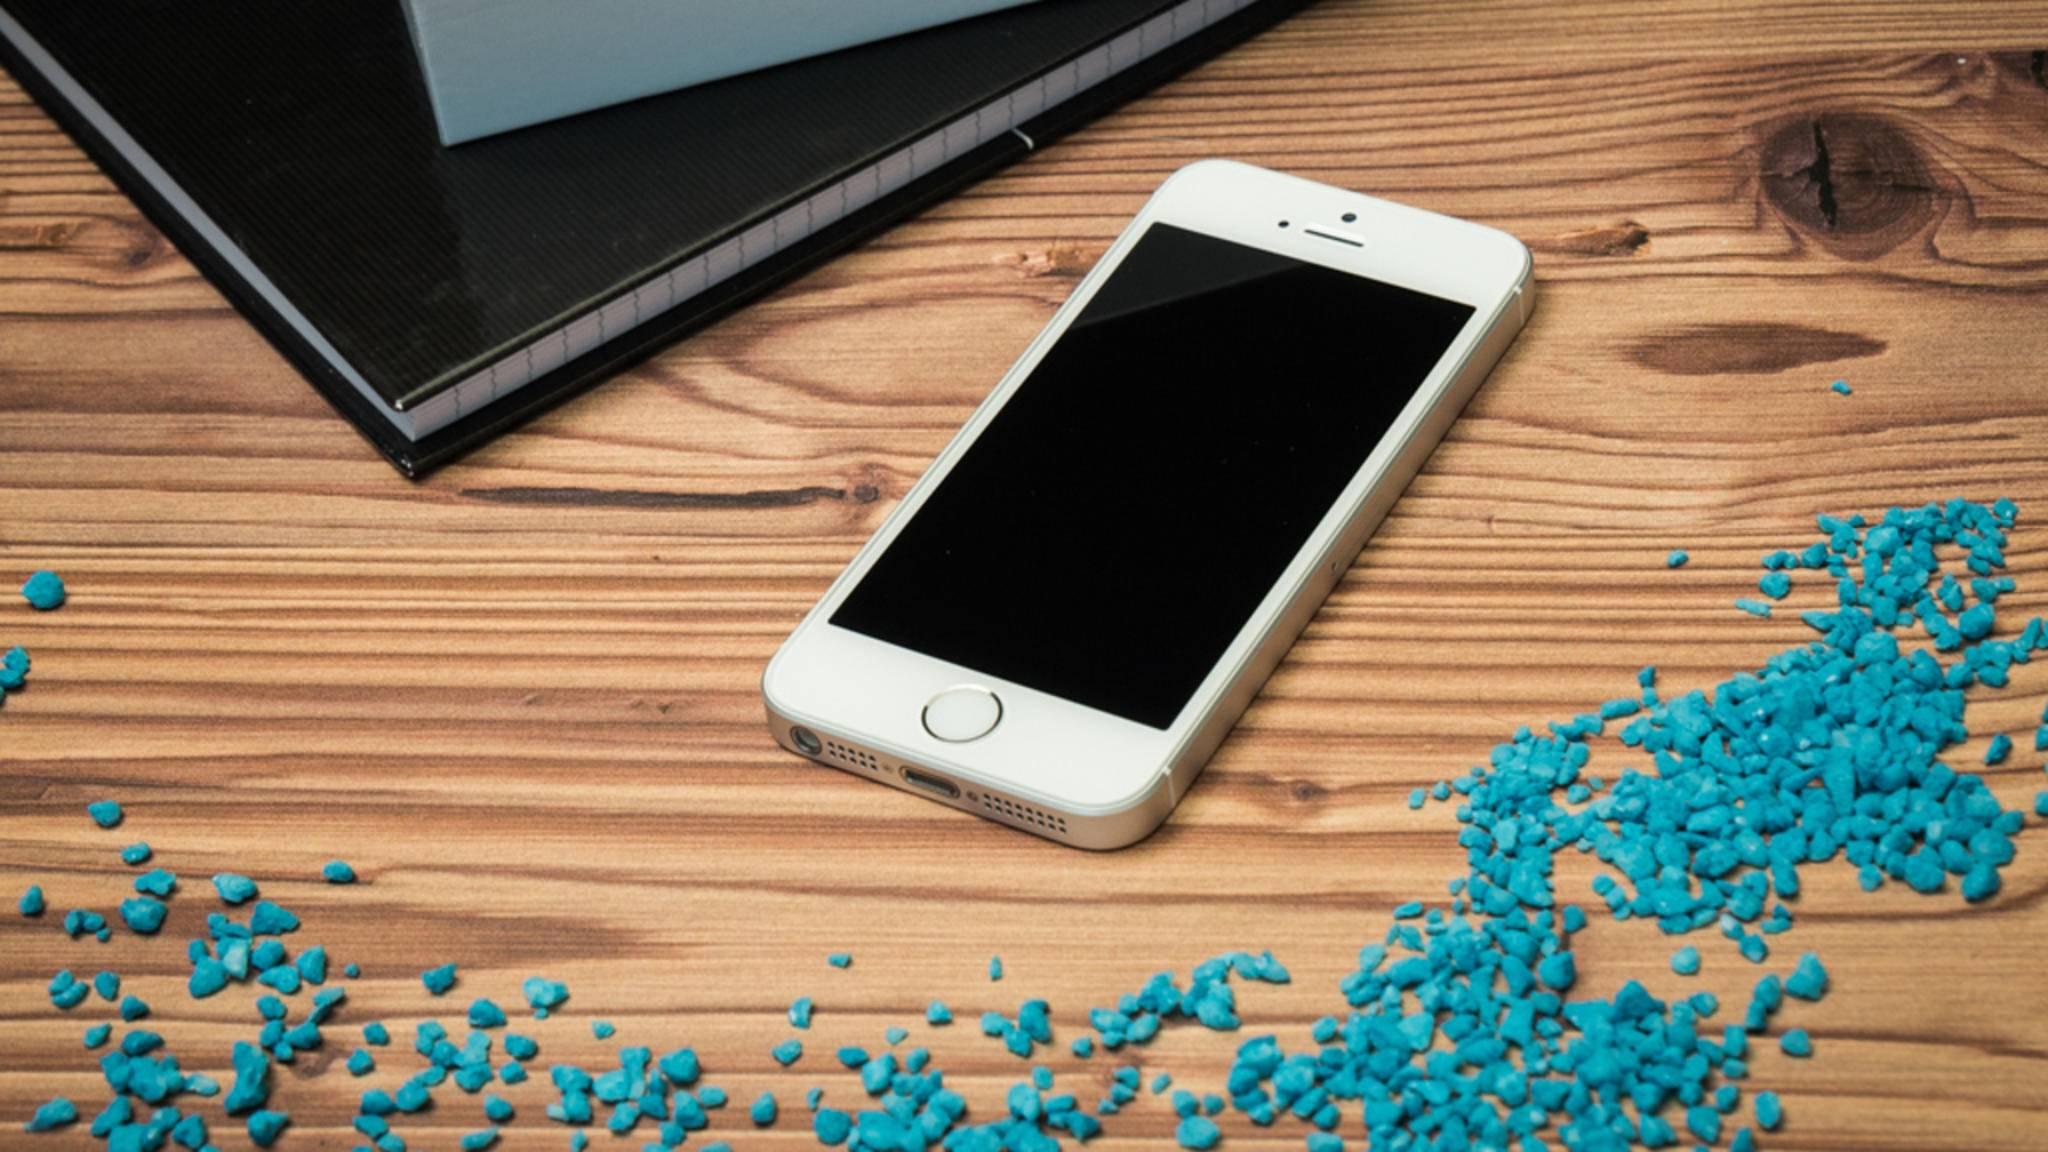 IPhone SE 2 Enthullung Im Marz